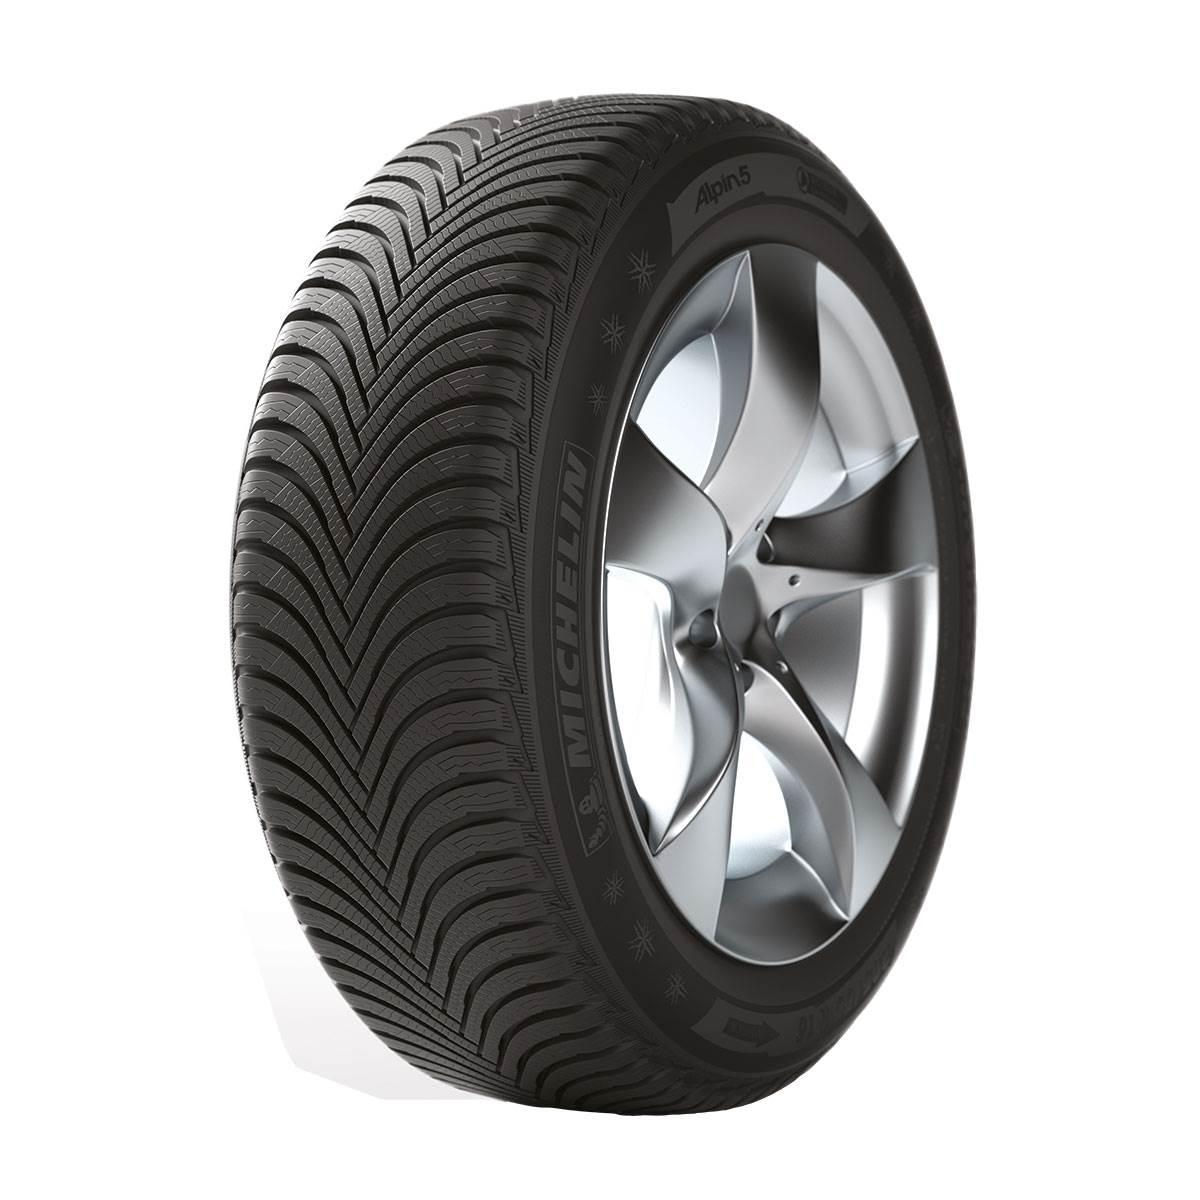 Pneu Hiver Michelin 215/55R16 97V Alpin A5 XL